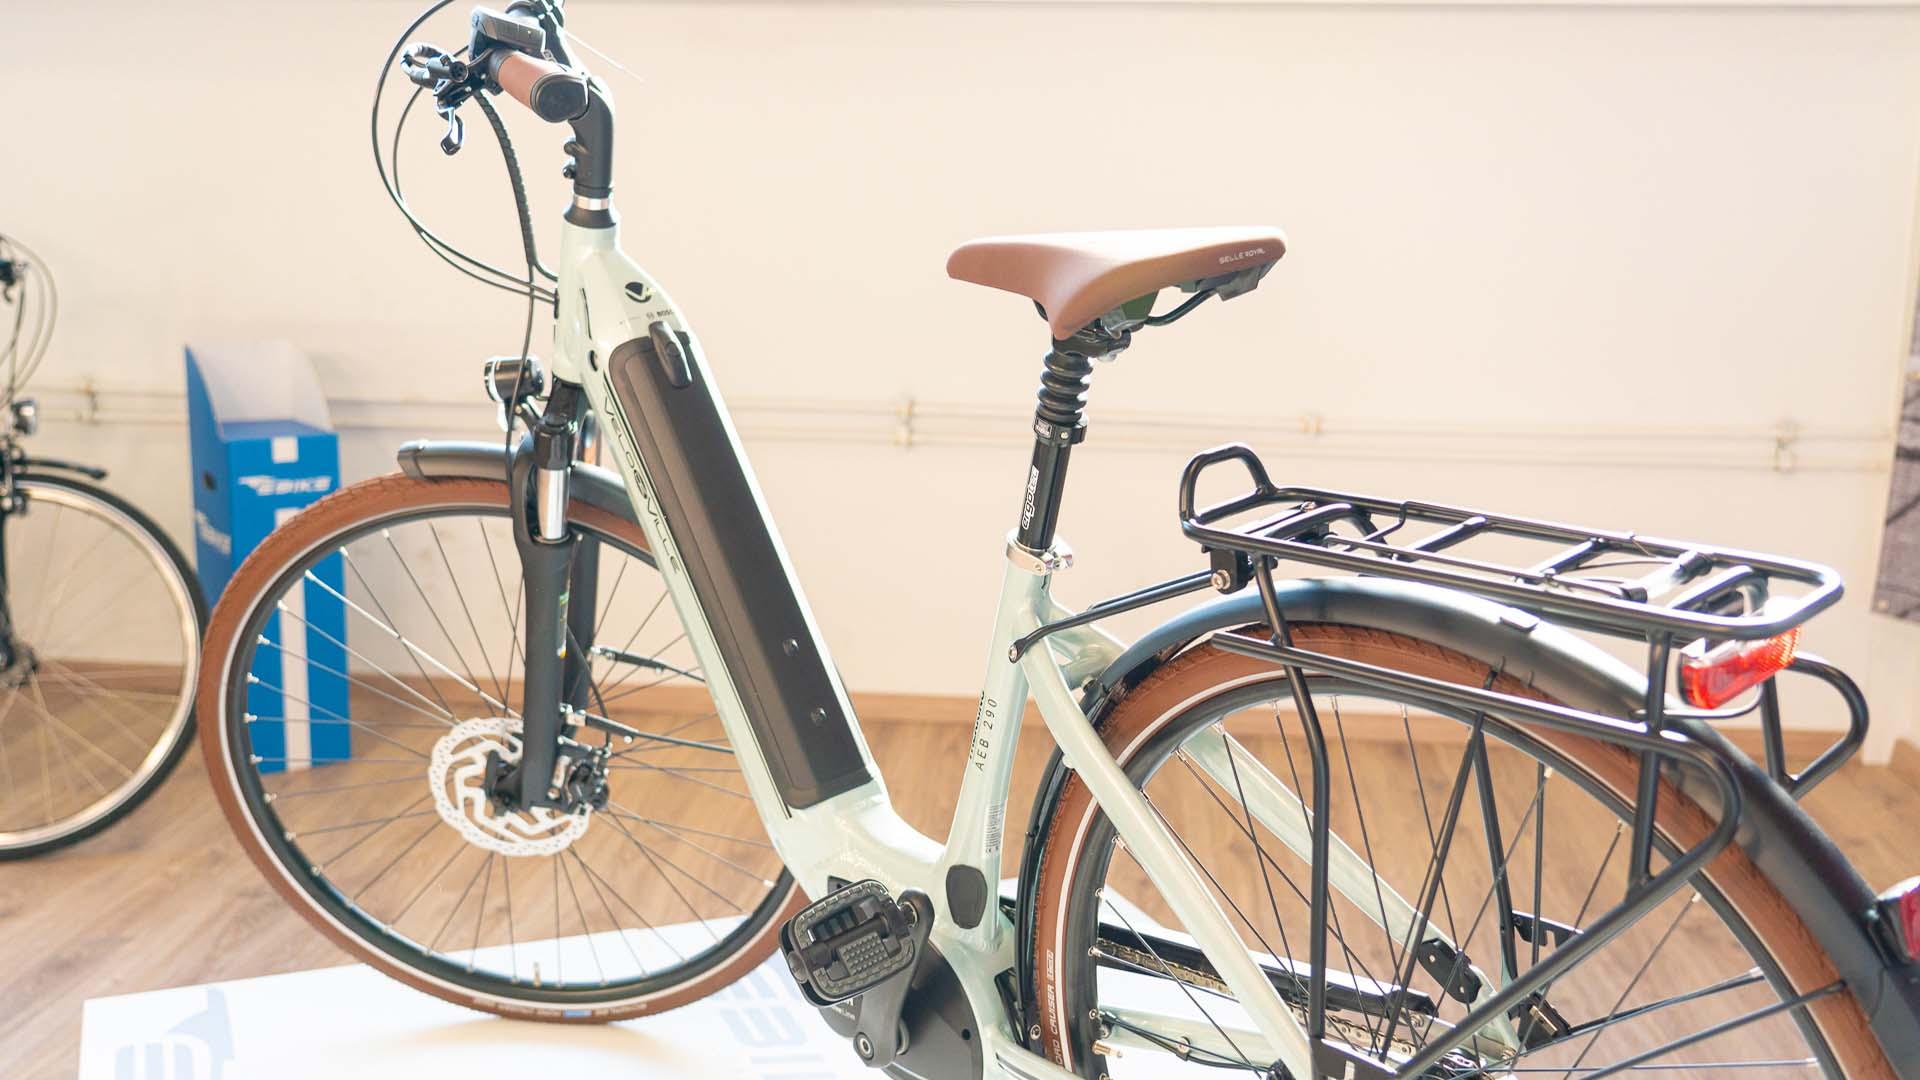 Fahrradzentrum Grauthoff Fotoshooting 8